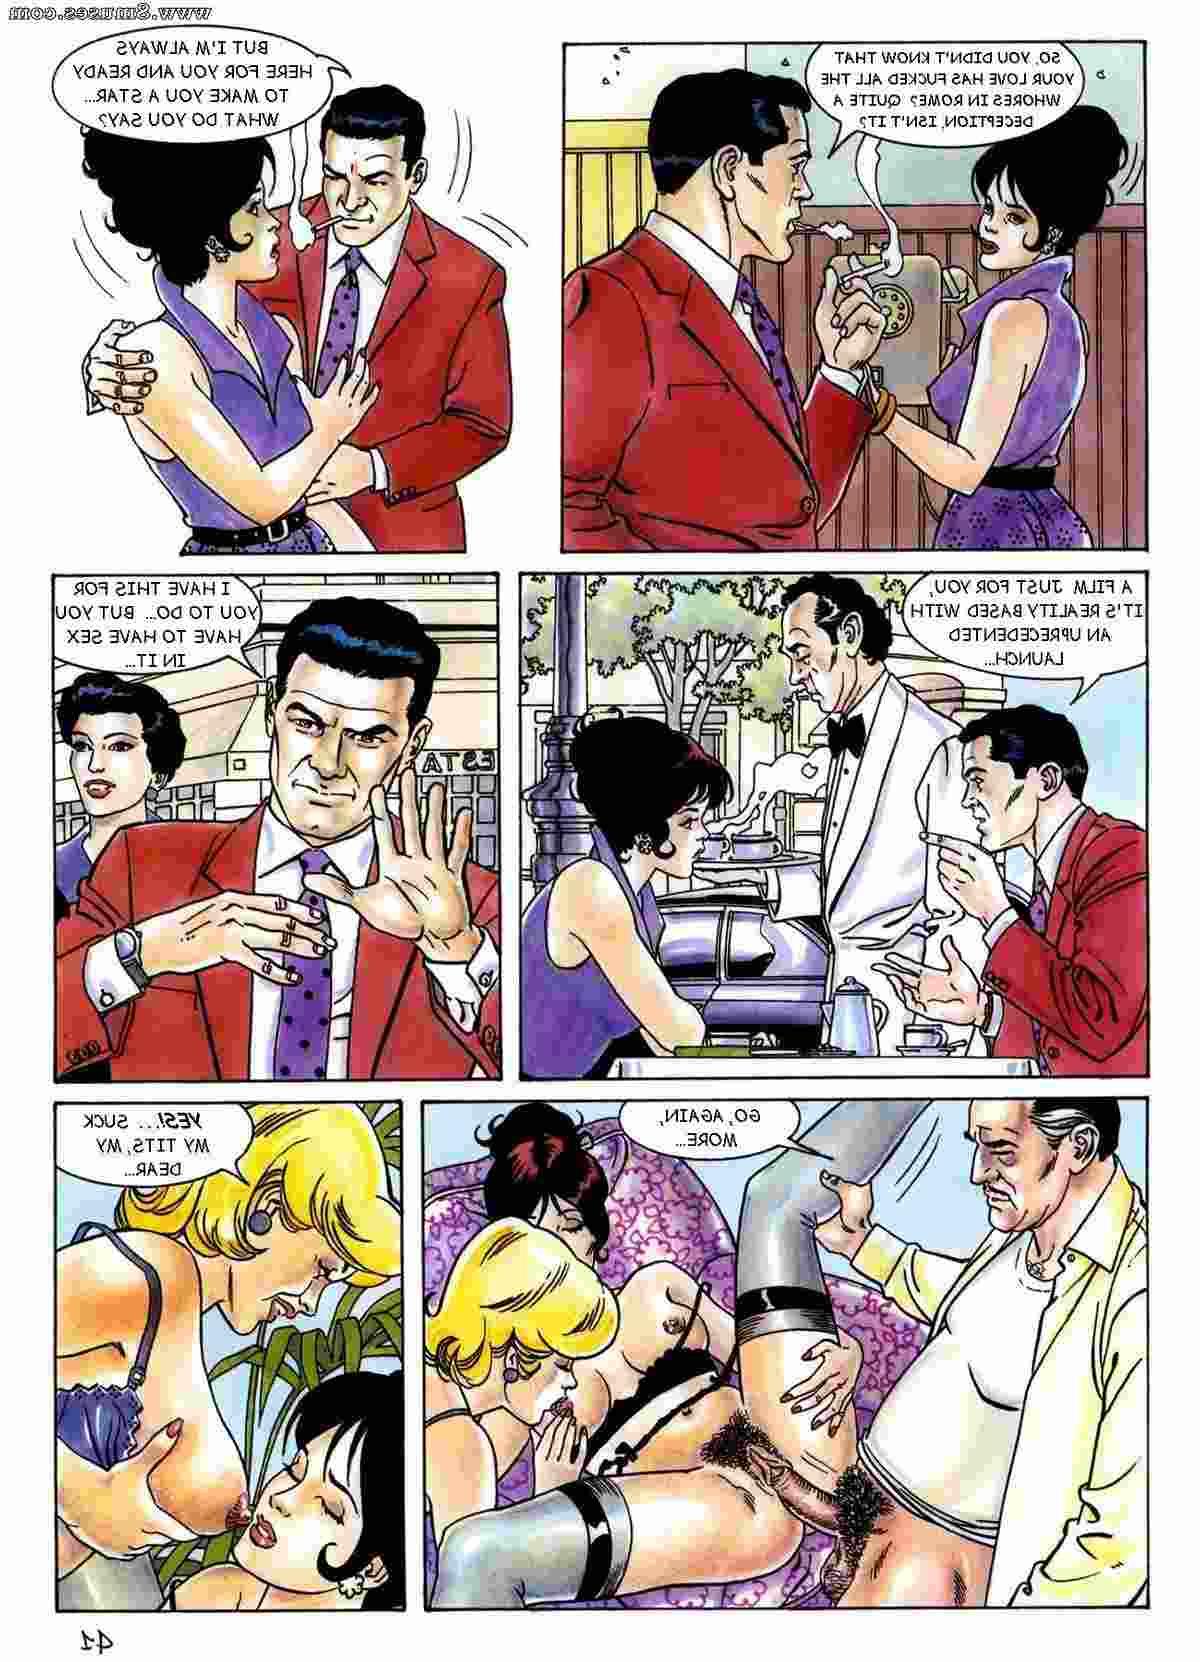 Stramaglia-Morale-Comics/Anna-Perverted-Innocence Anna_Perverted_Innocence__8muses_-_Sex_and_Porn_Comics_44.jpg